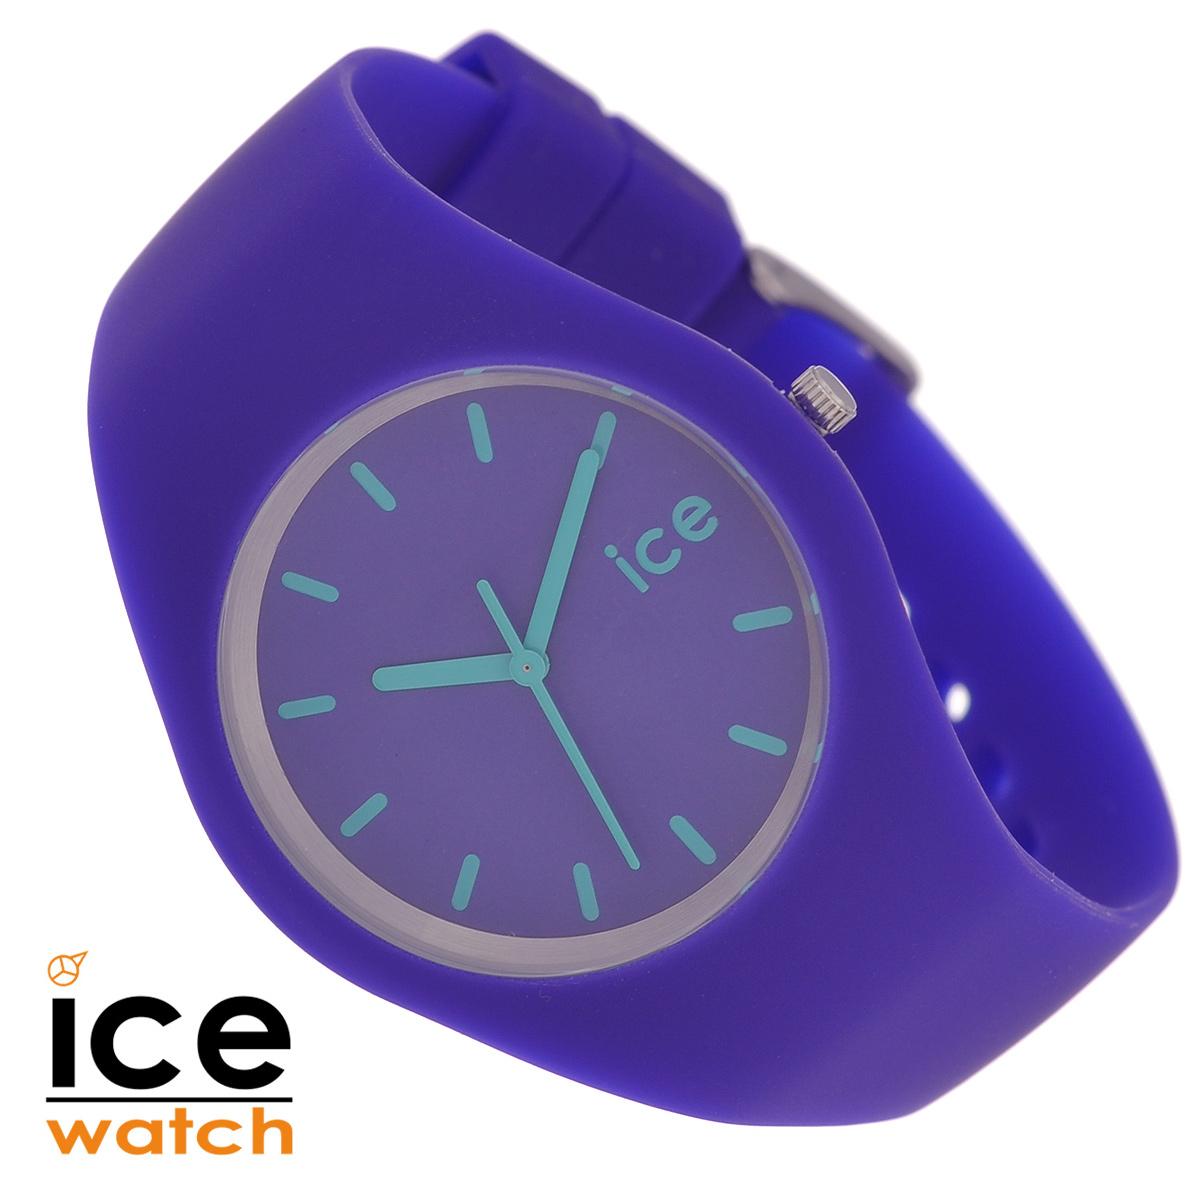 ice watch часы купить аромат